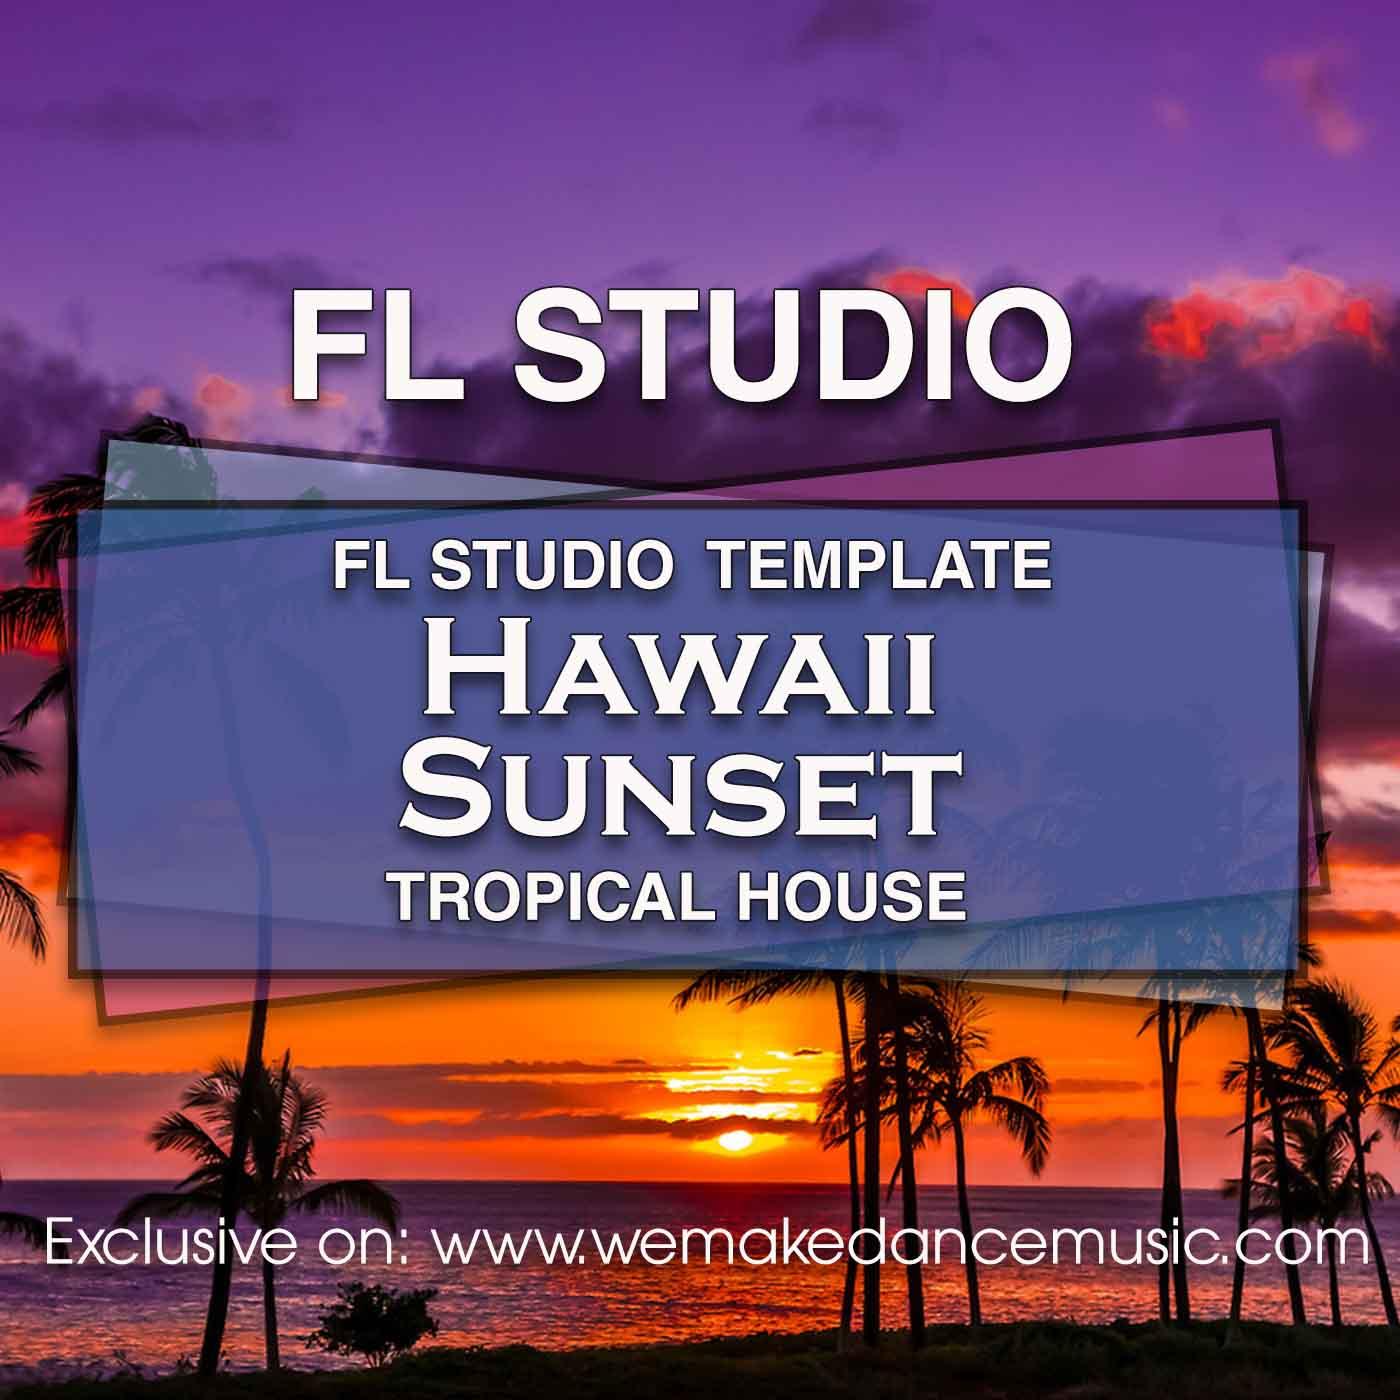 FL Studio Template Hawaii Sunset